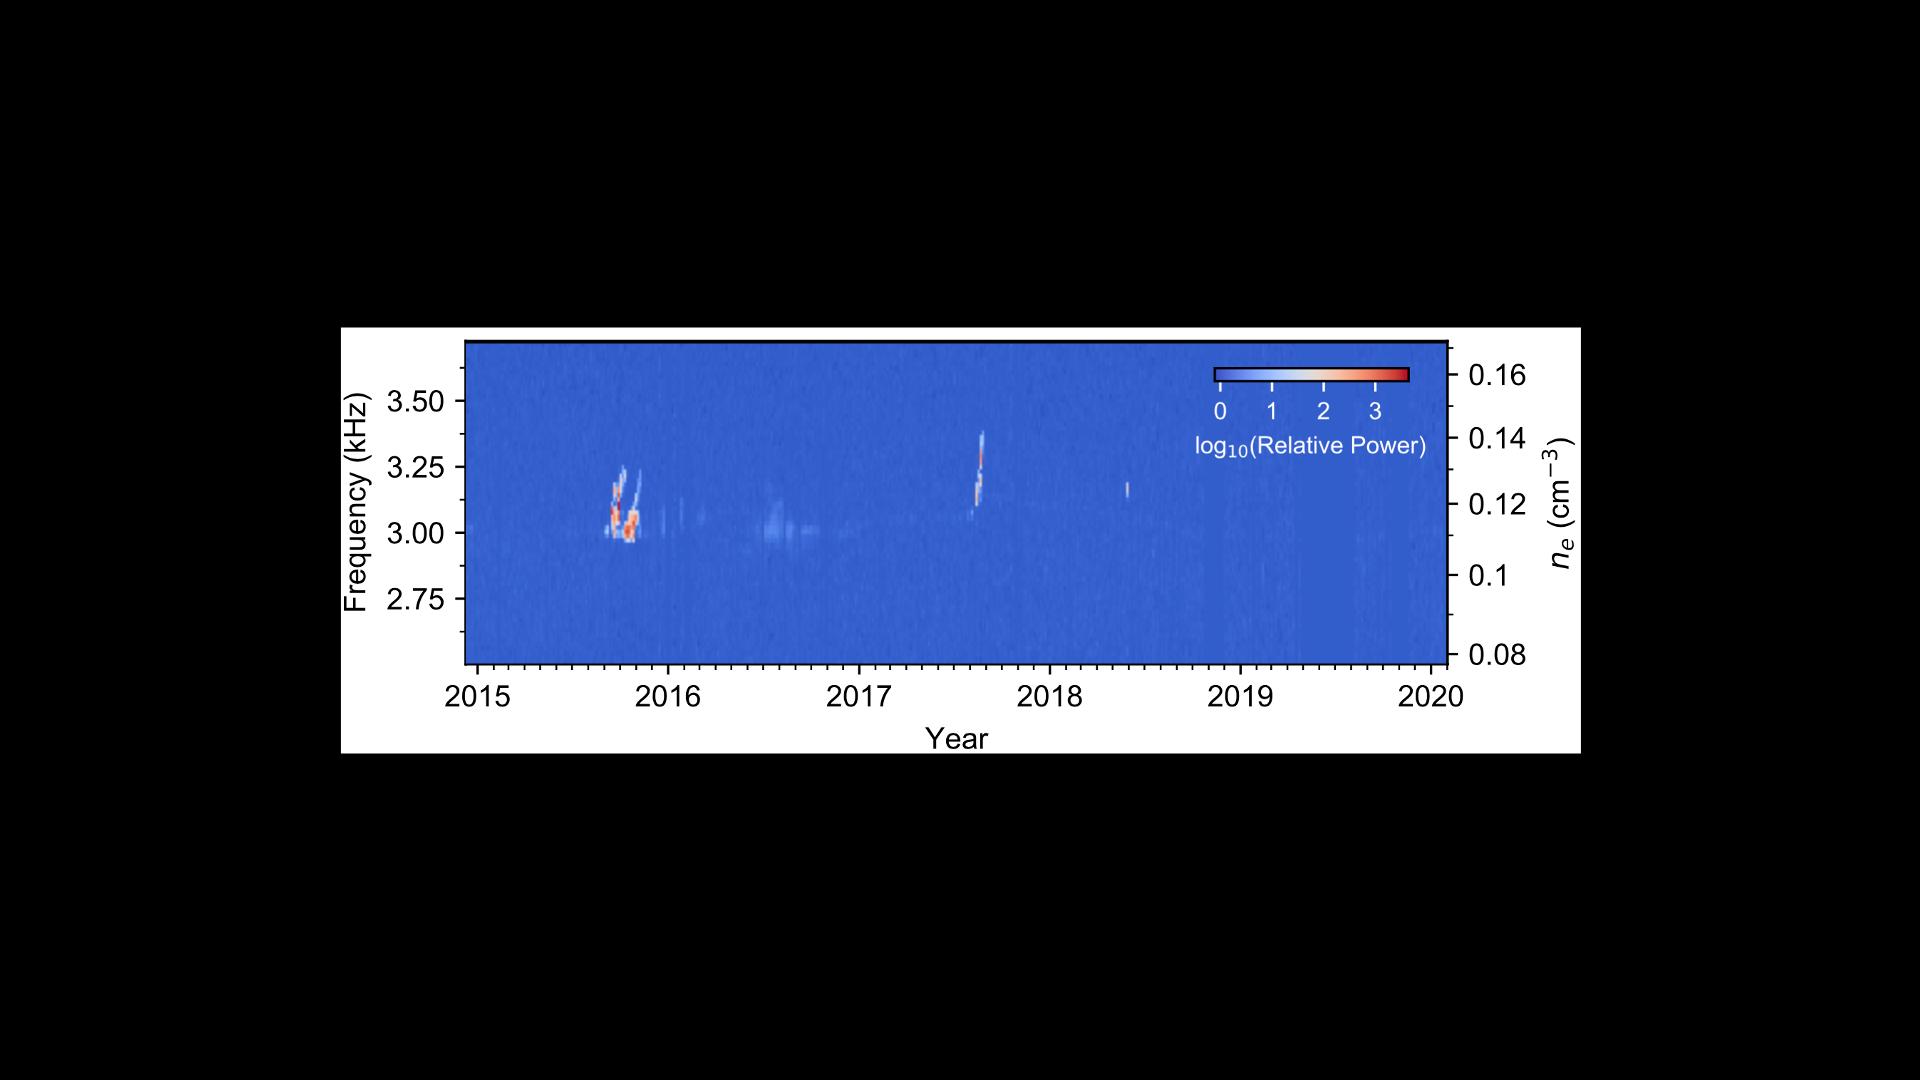 Credits: NASA's Voyager 1Plasma Wave Subsystem/Stella Ocker